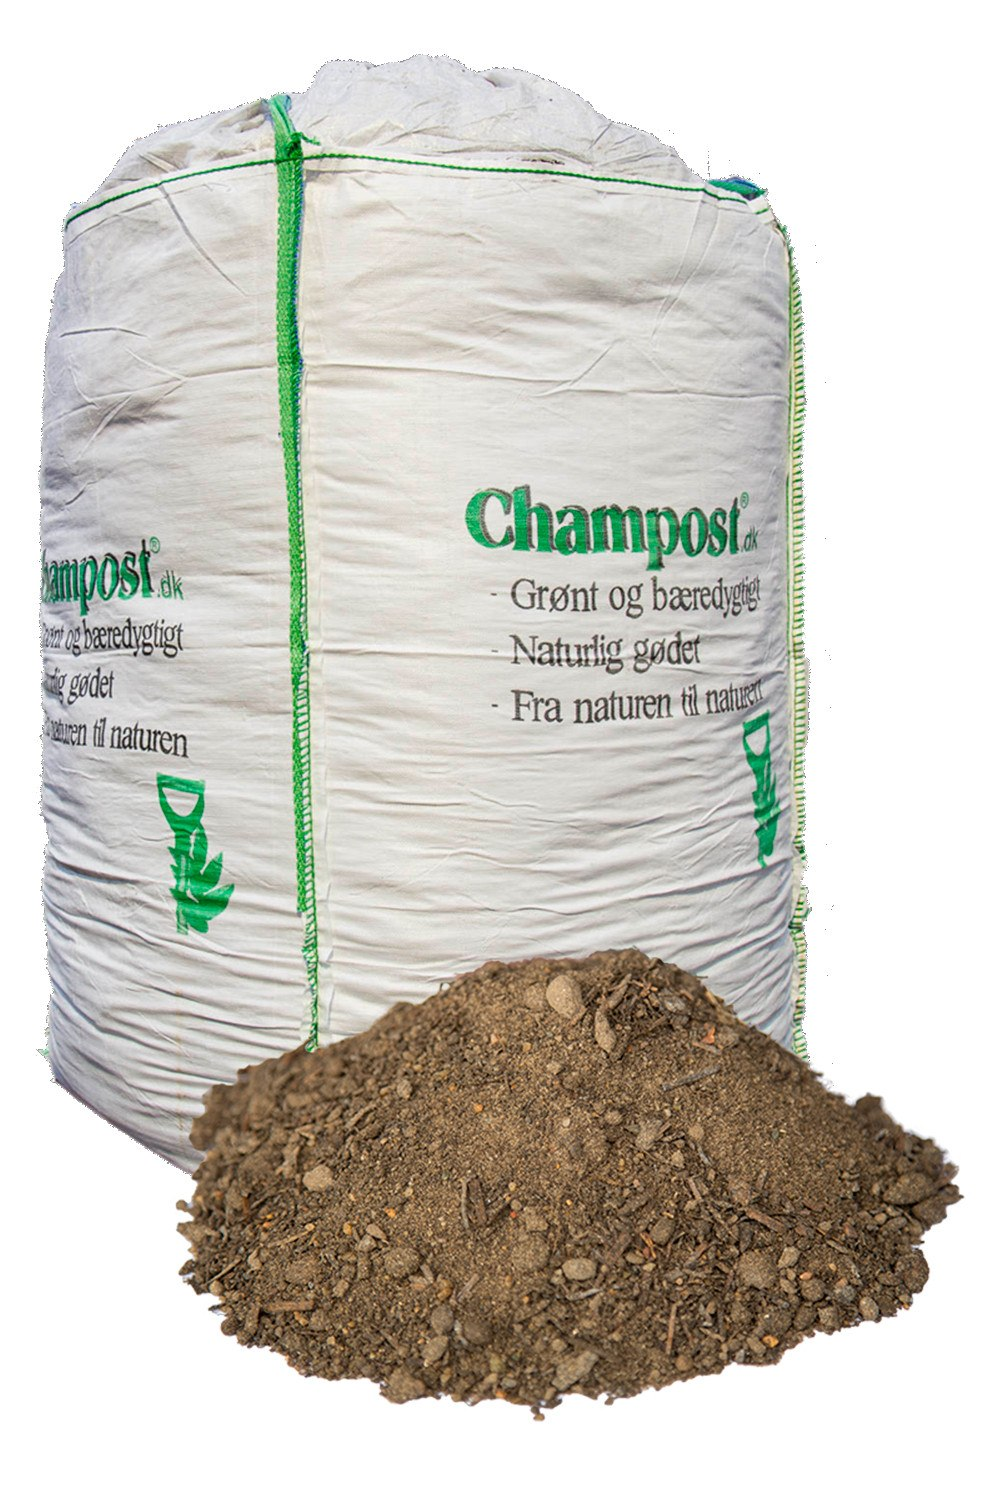 Champost Plantemuld - 900 liter